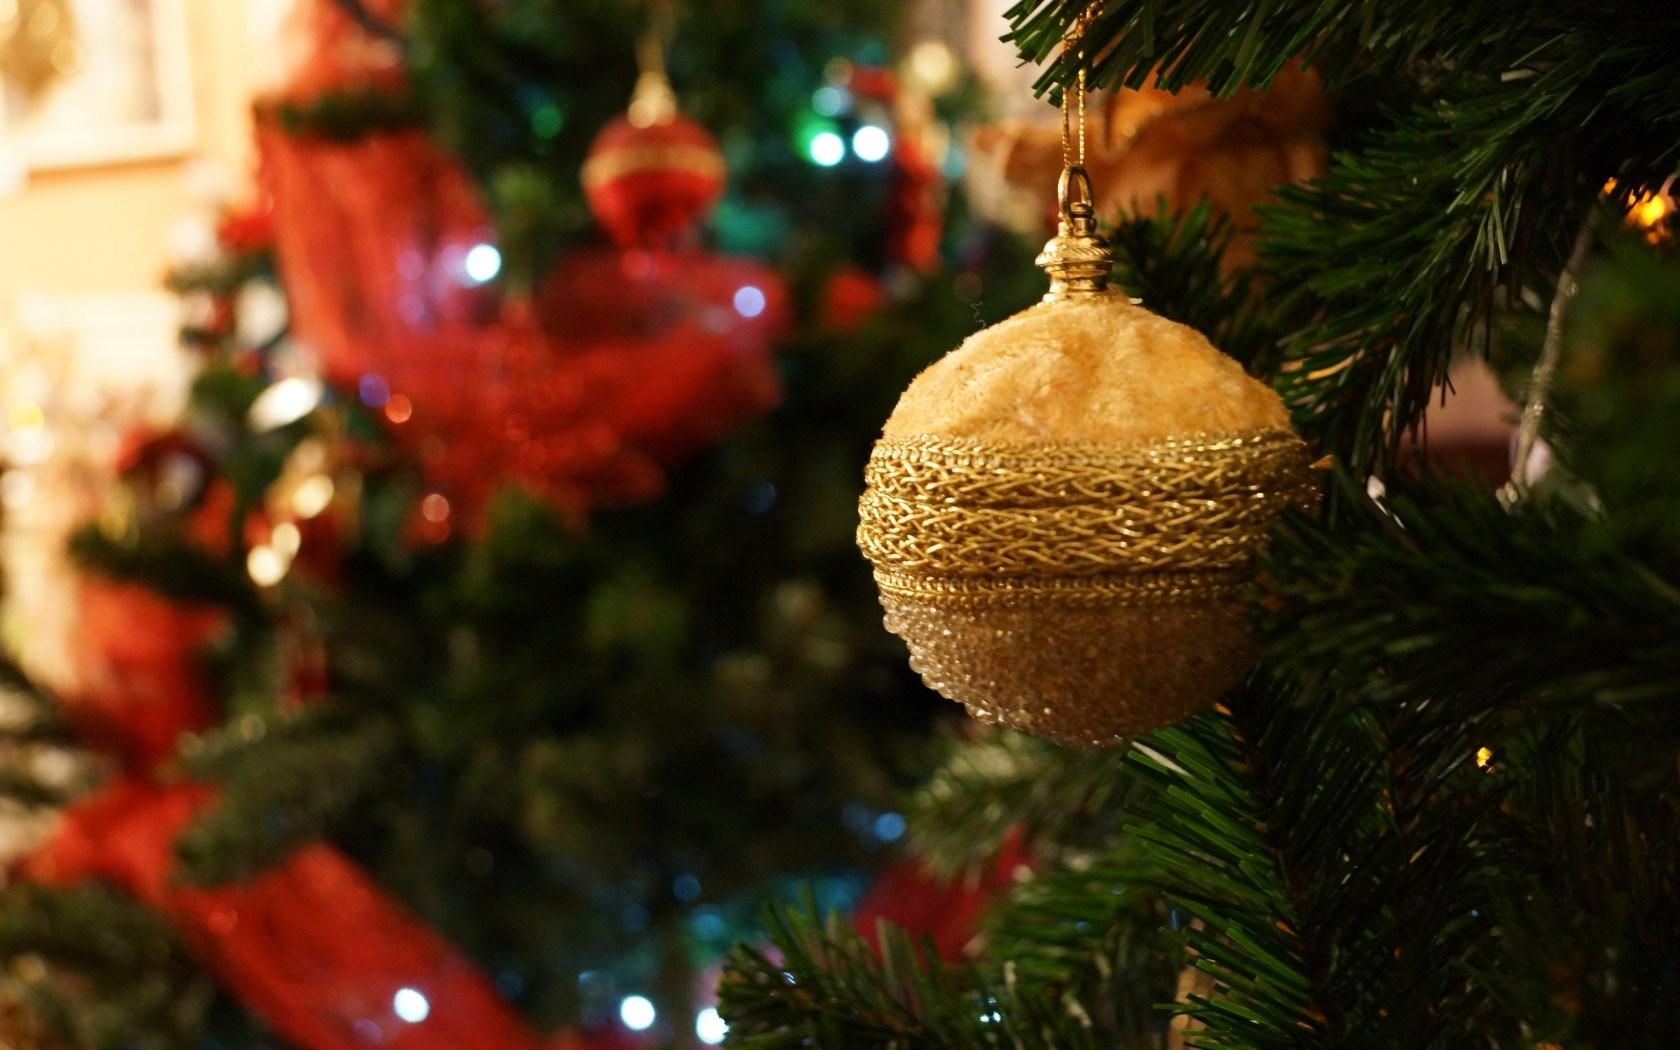 Christmas Tree Close-Up New Year HD Wallpaper